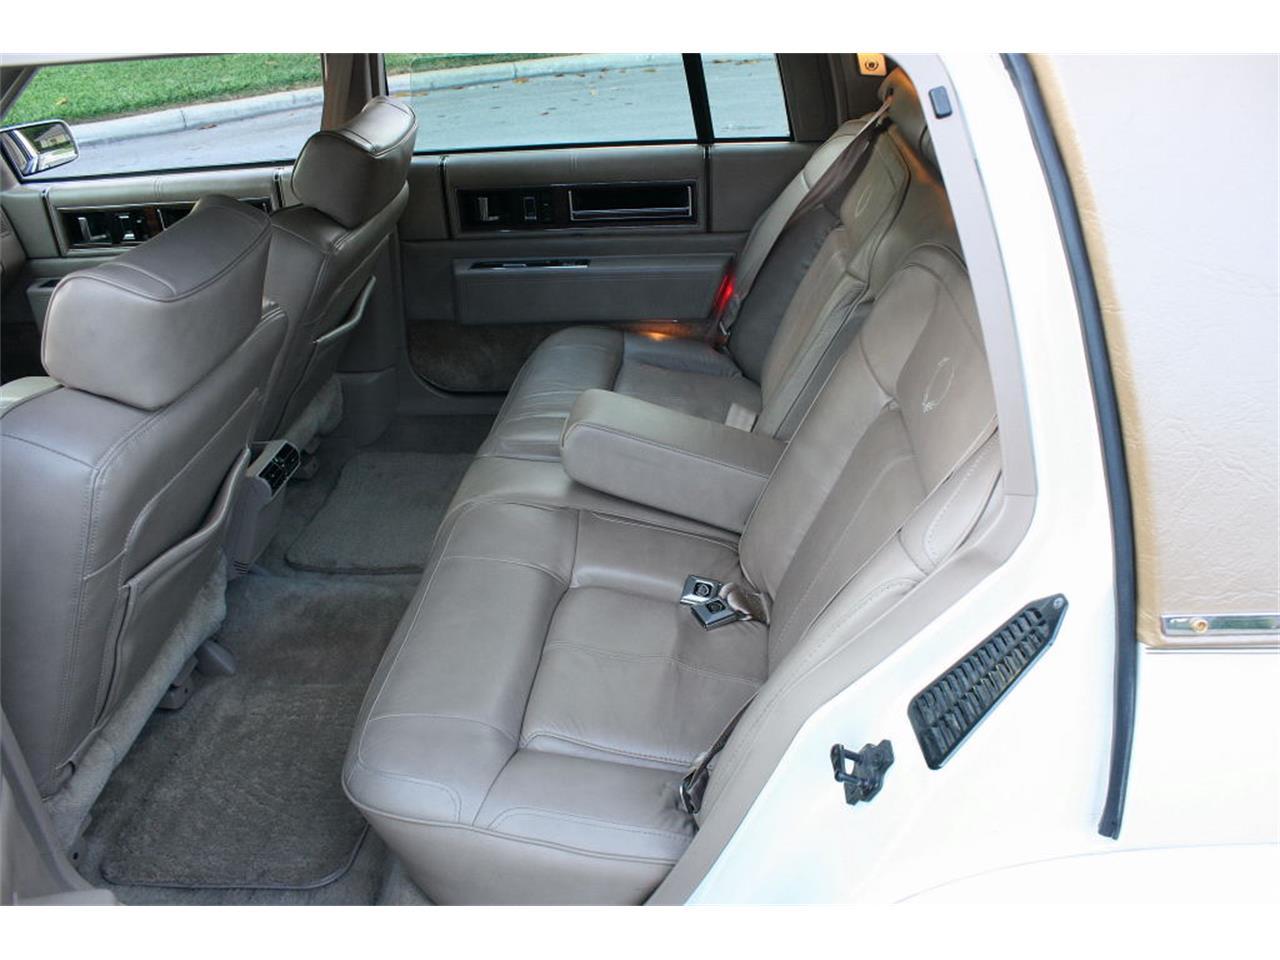 Large Picture of 1991 Cadillac Sedan located in Lakeland Florida - $9,500.00 - L5XM